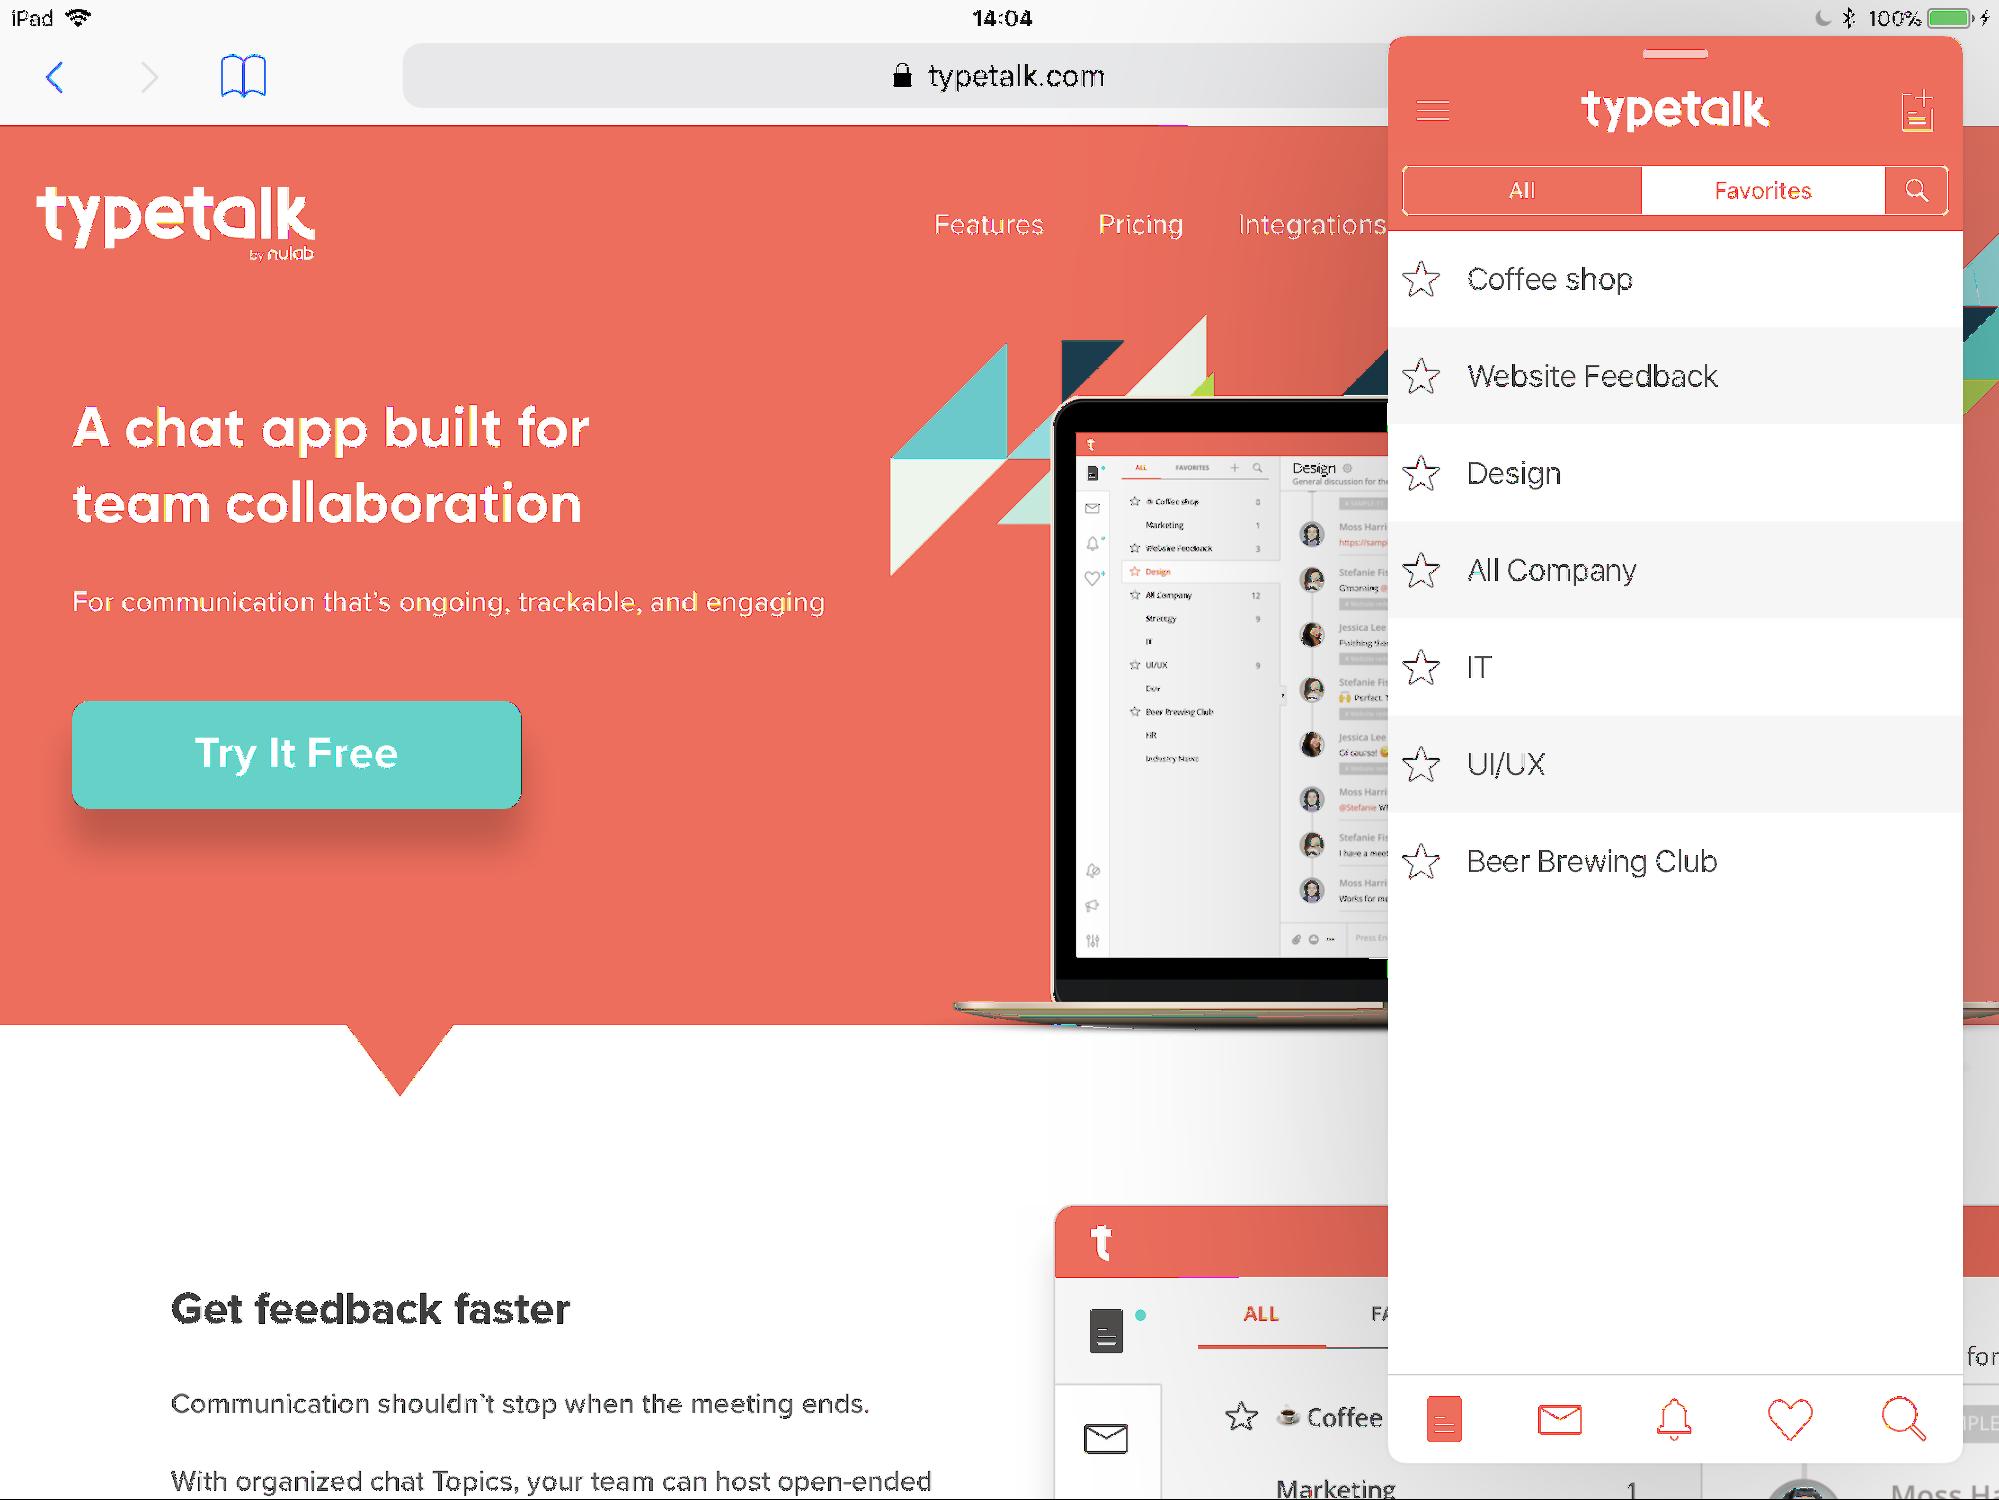 Multitasking on iPad with Typetalk